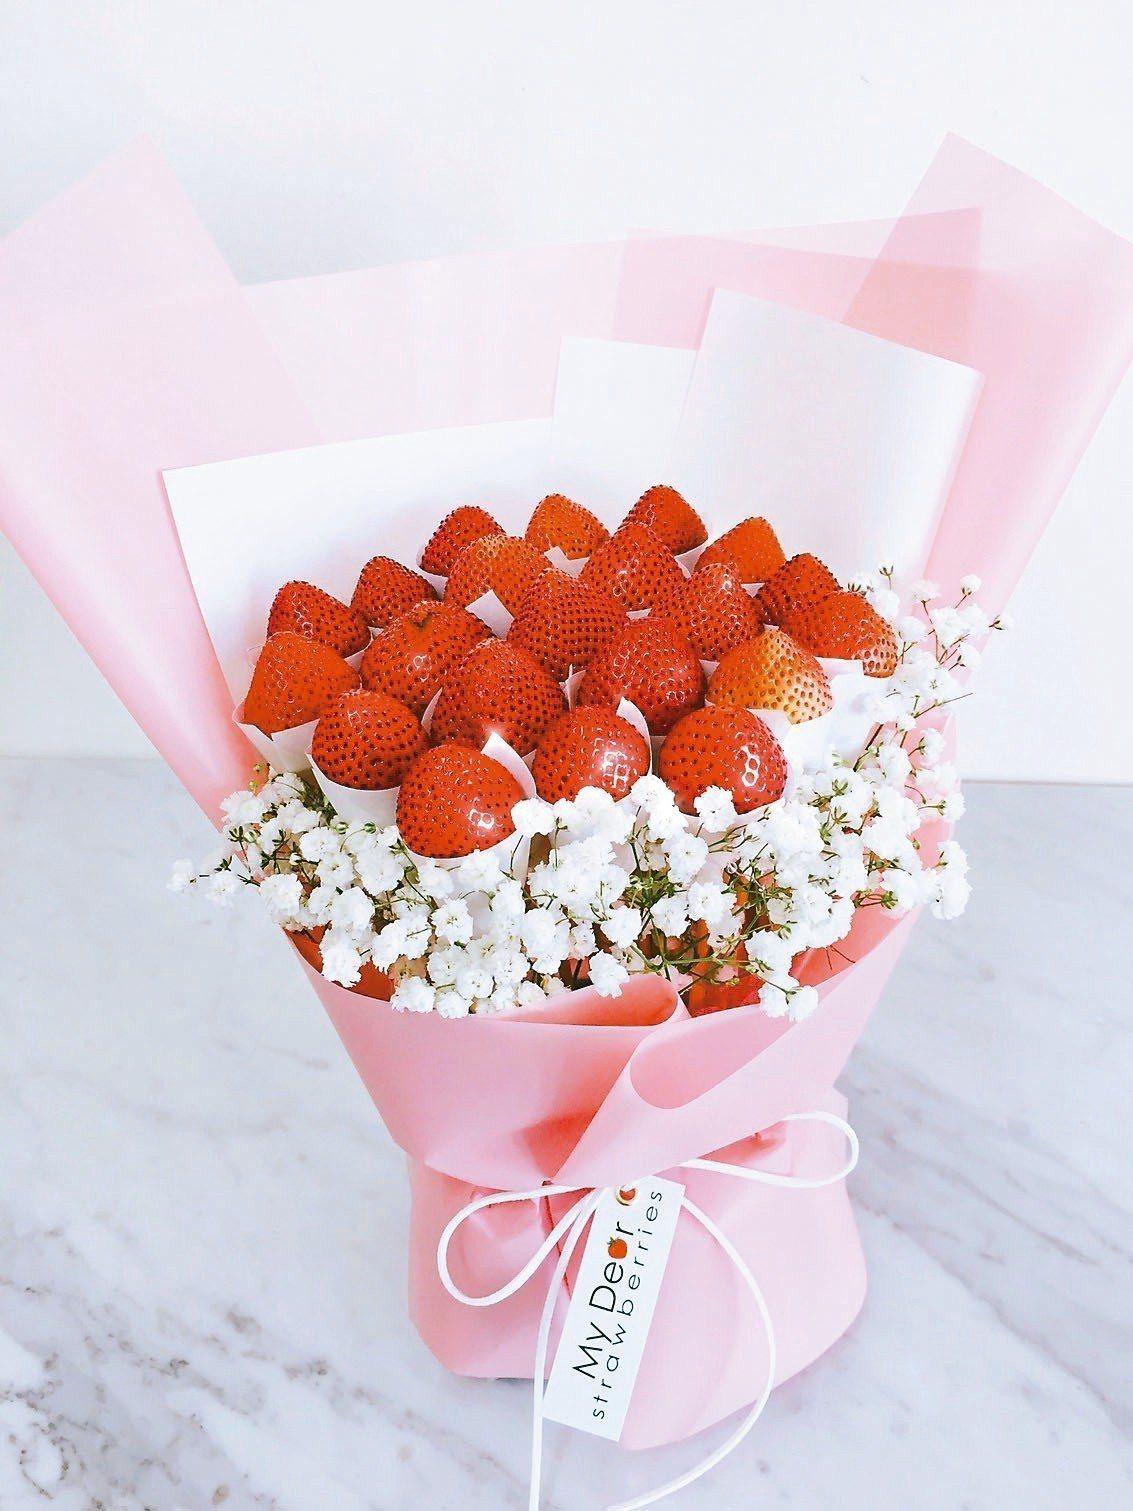 SOGO忠孝館耶誕市集,草莓花束特價1,999元。 圖/SOGO提供